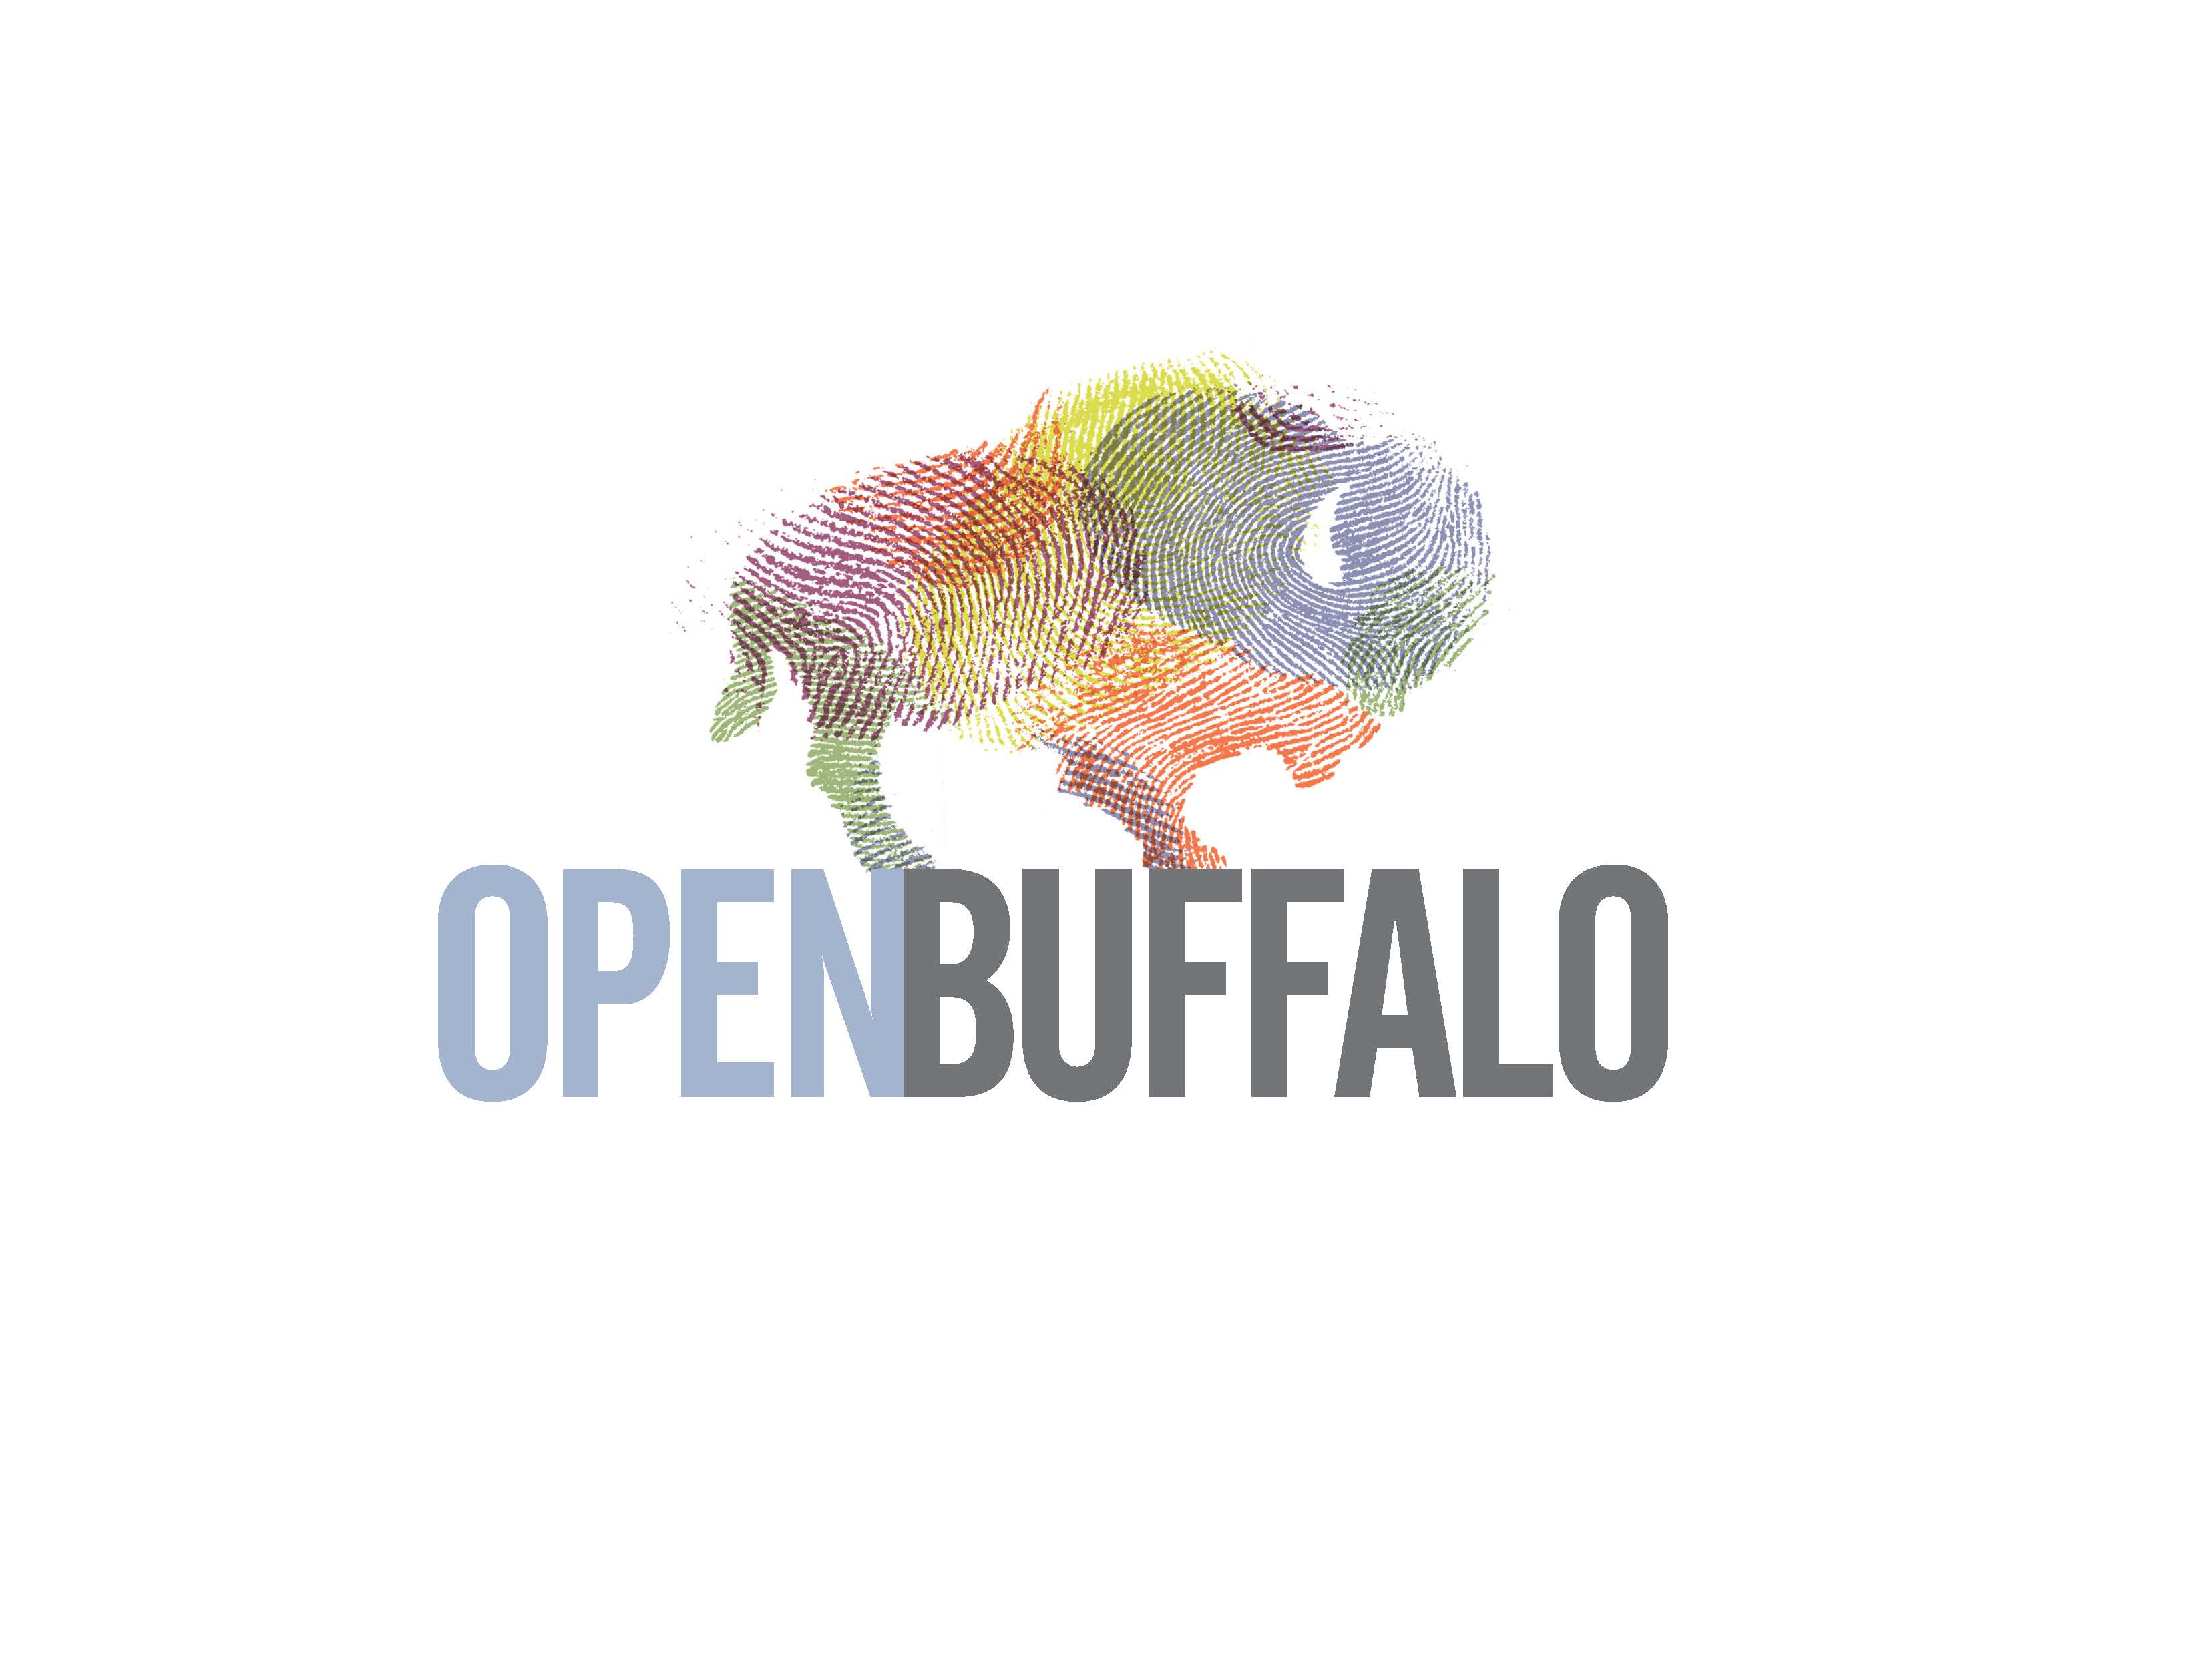 Peoples platform event to present blueprint for better buffalo peoples platform event to present blueprint for better buffalo malvernweather Choice Image